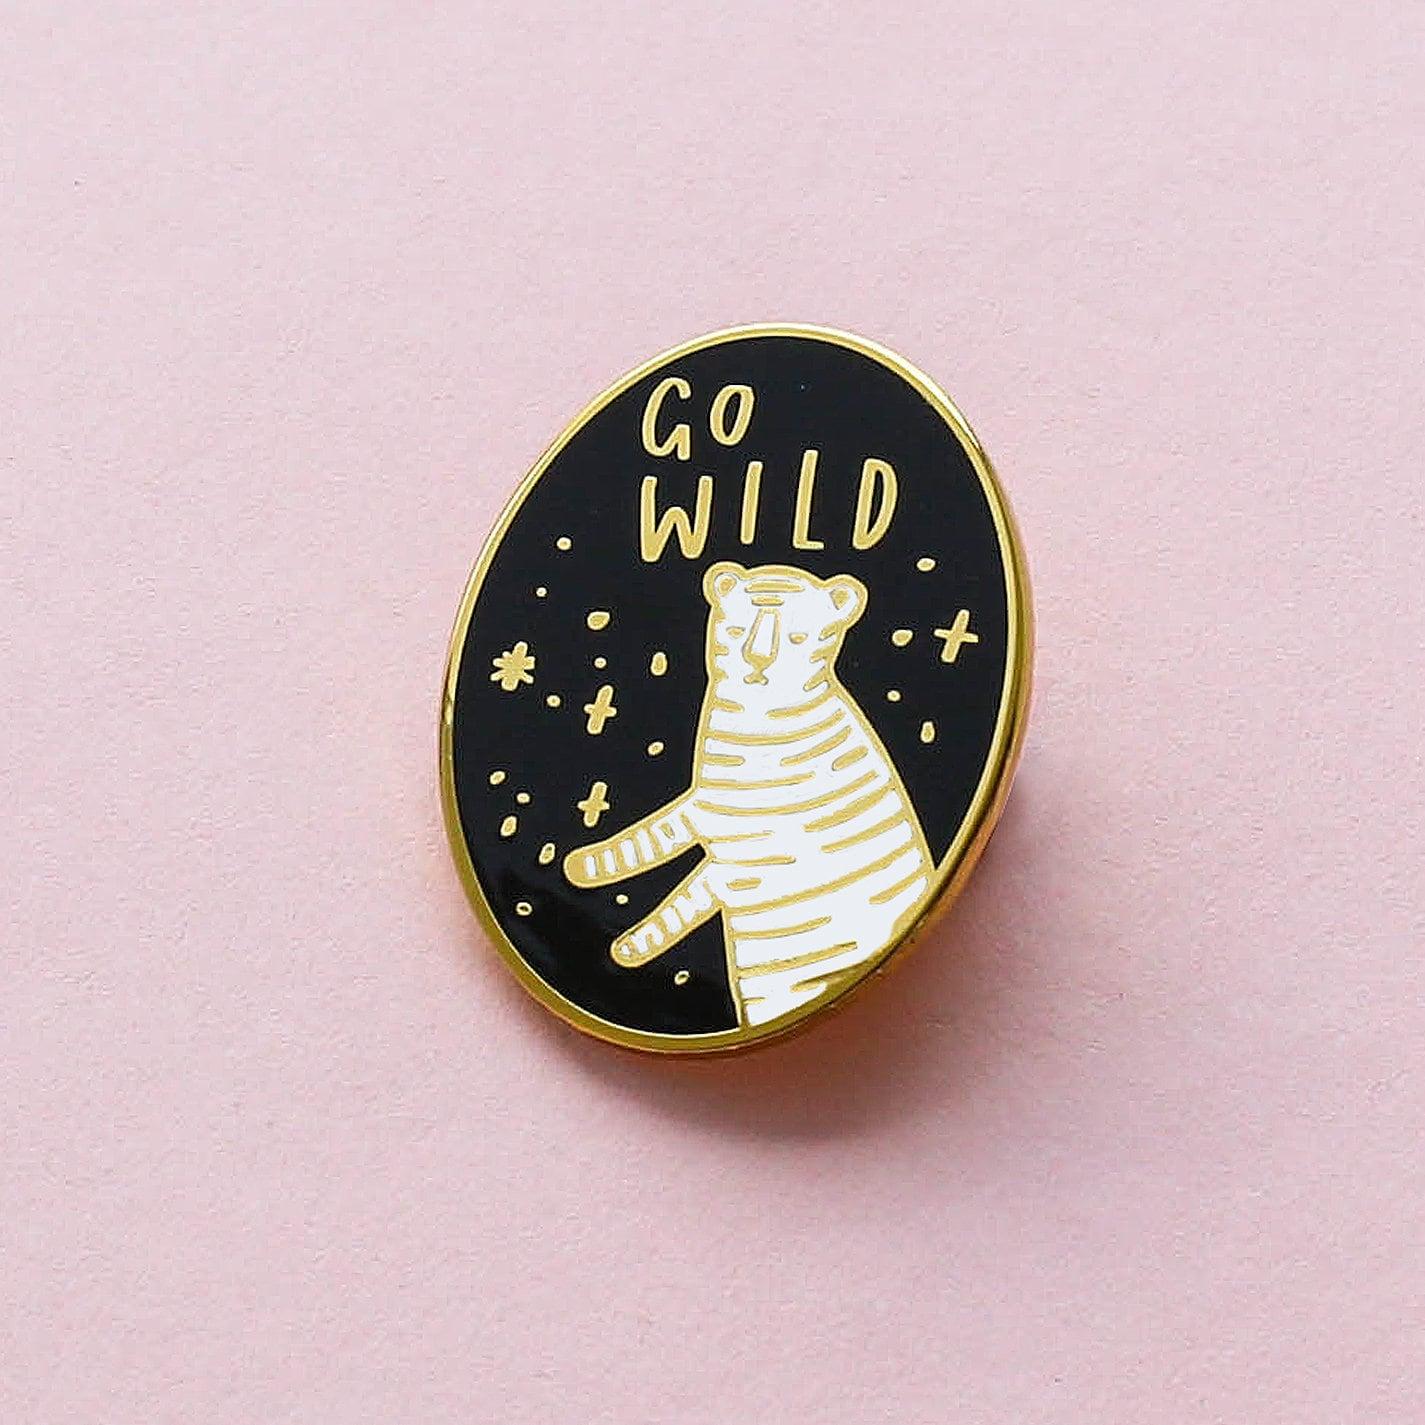 5591108a1d3 Go Wild Enamel Pin Tiger Go Wild Enamel Pin Enamel Lapel | Etsy